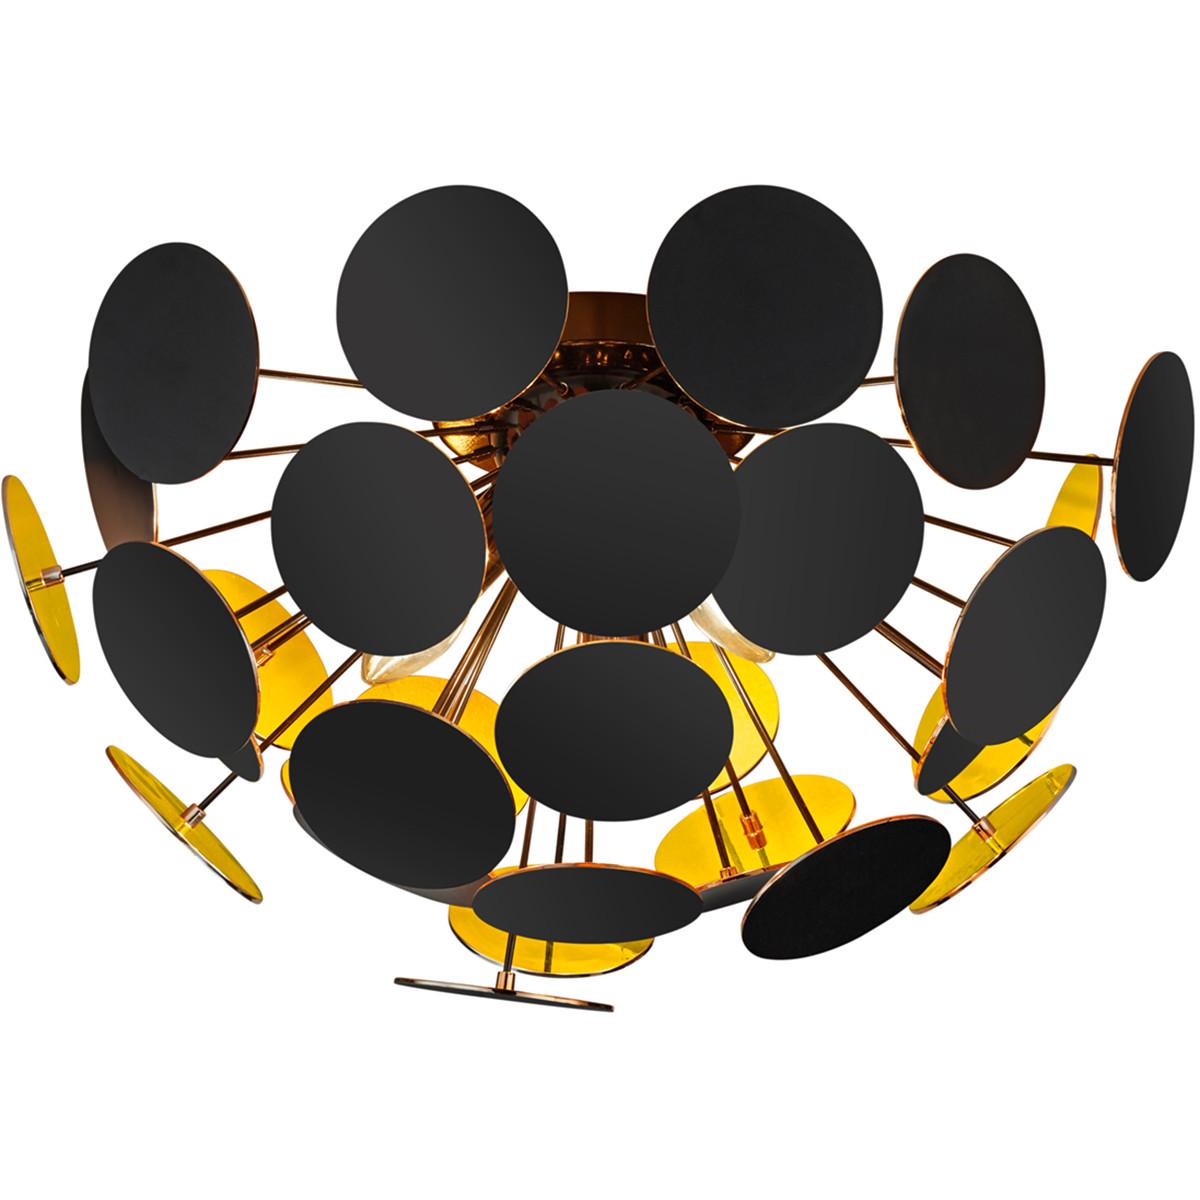 LED Plafondlamp - Plafondverlichting - Trion Discon - E14 Fitting - 3-lichts - Rond - Mat Zwart Alum